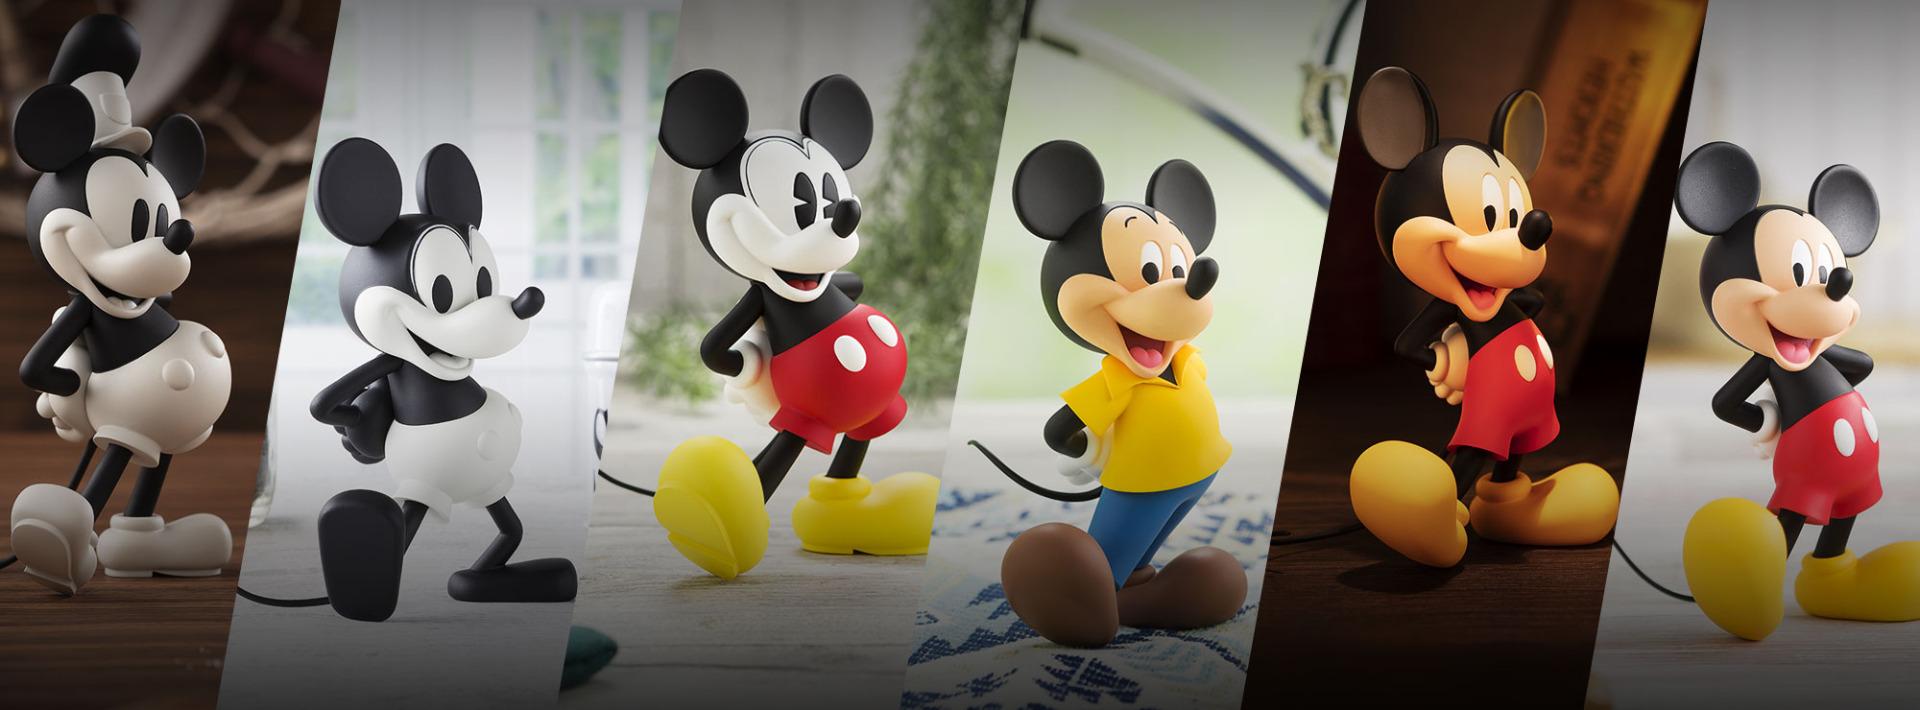 Bandai Figuarts Zero Mickey Mouse